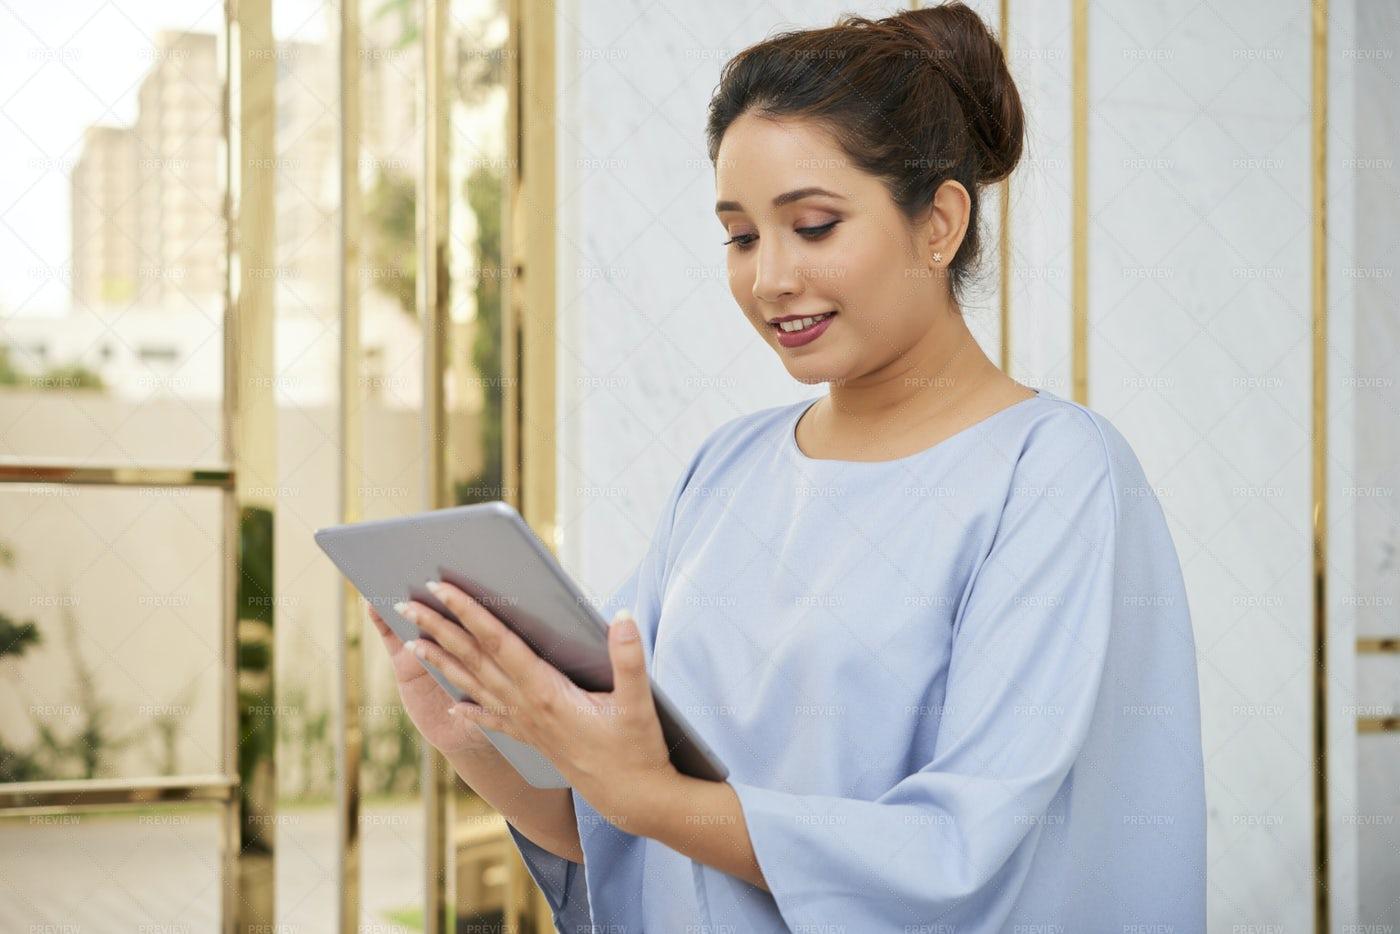 Businesswoman Using Digital Tablet: Stock Photos